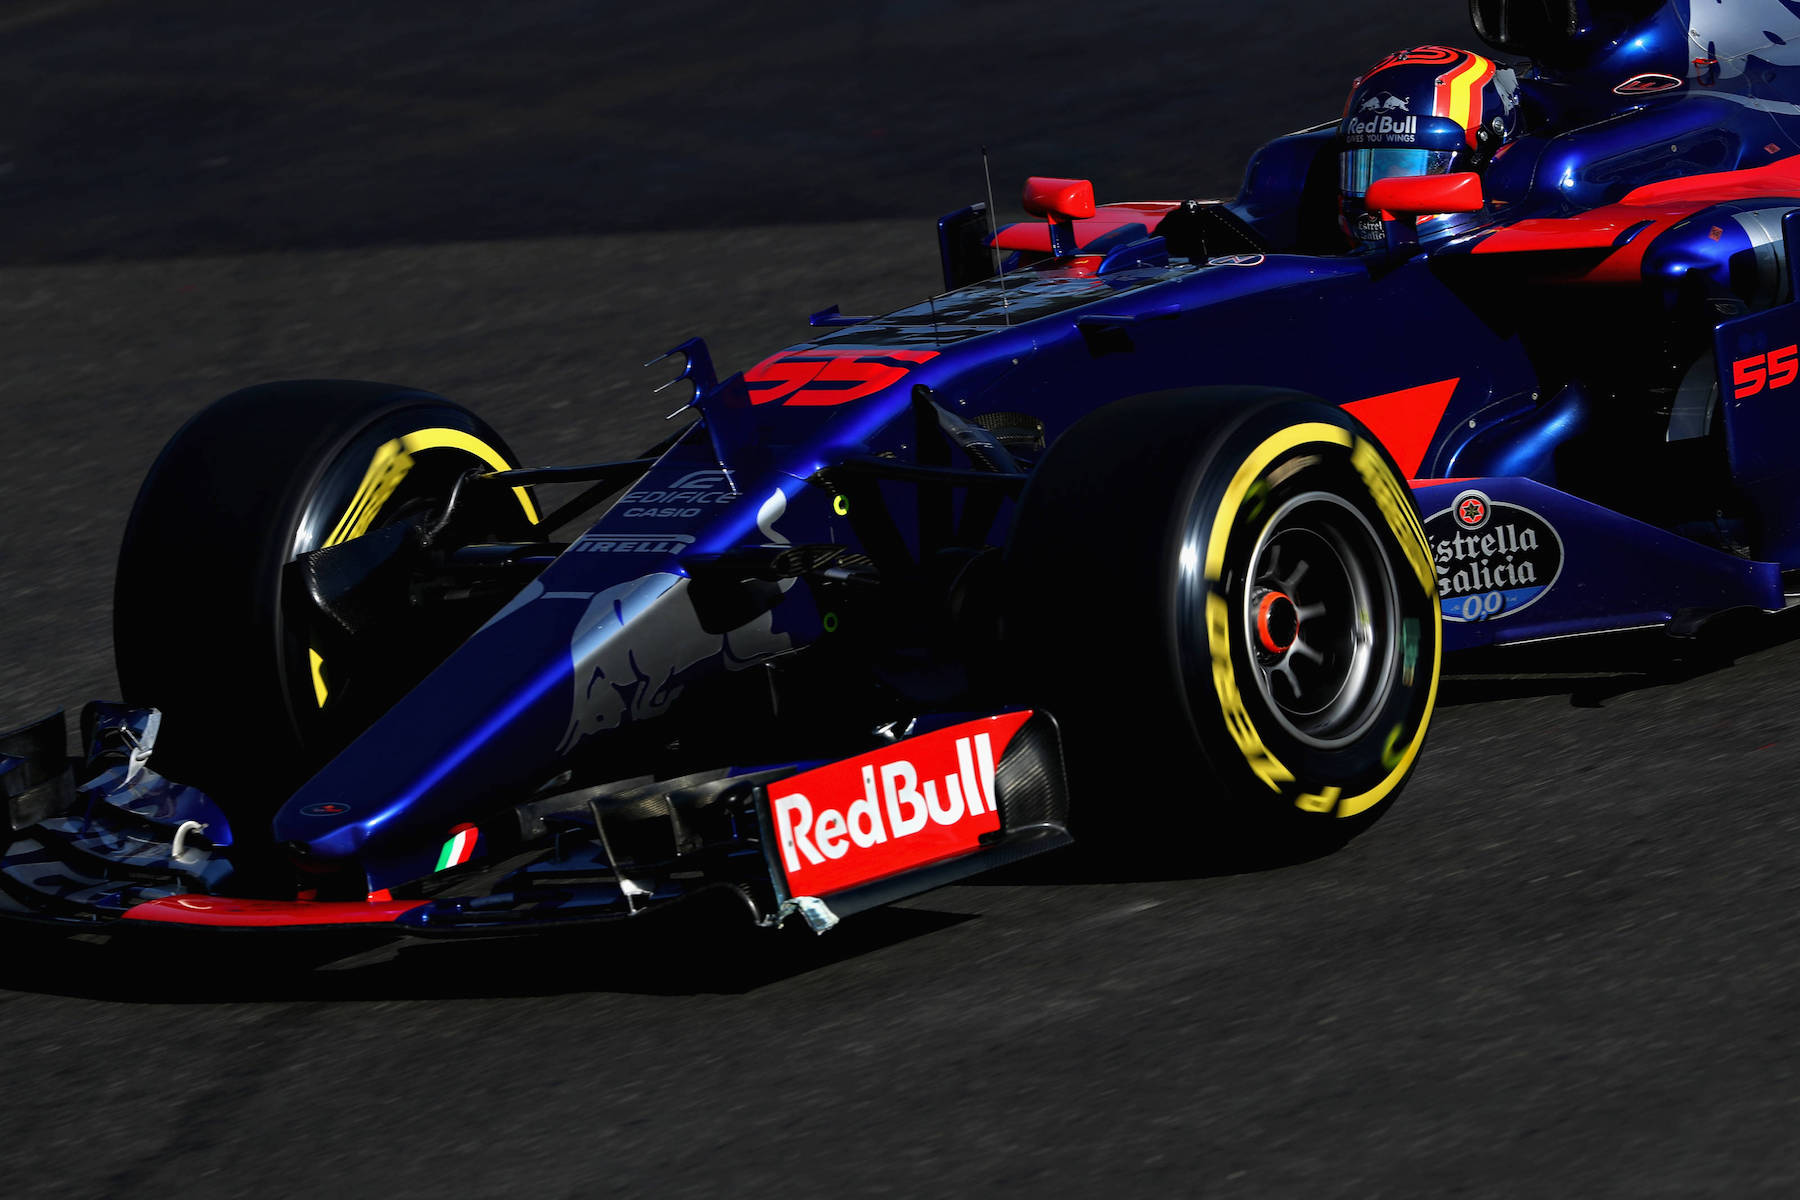 G 2017 Carlos Sainz | Toro Rosso STR12 | 2017 Azerbaijan GP P8 1 copy.jpg